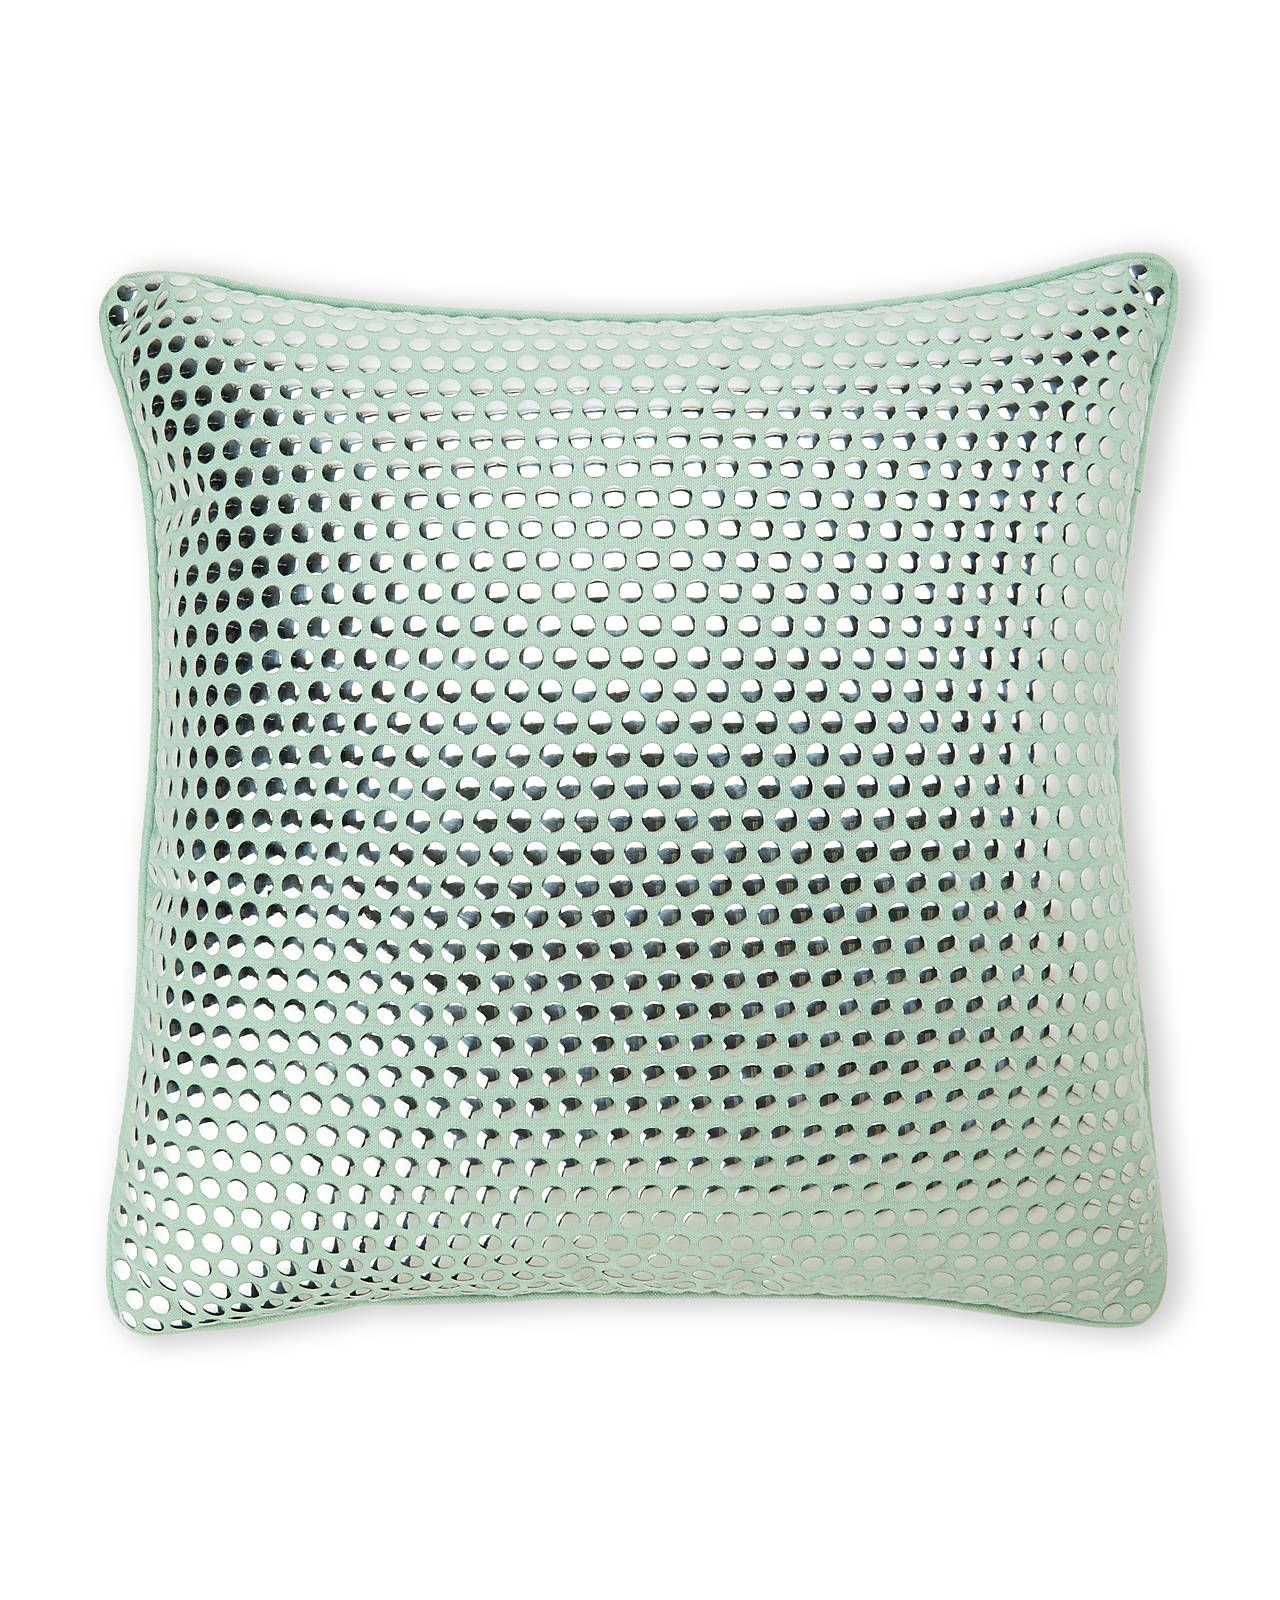 Thro By Marlo Lorenz Odom Studded Throw Pillow | Bedroom | Pinterest